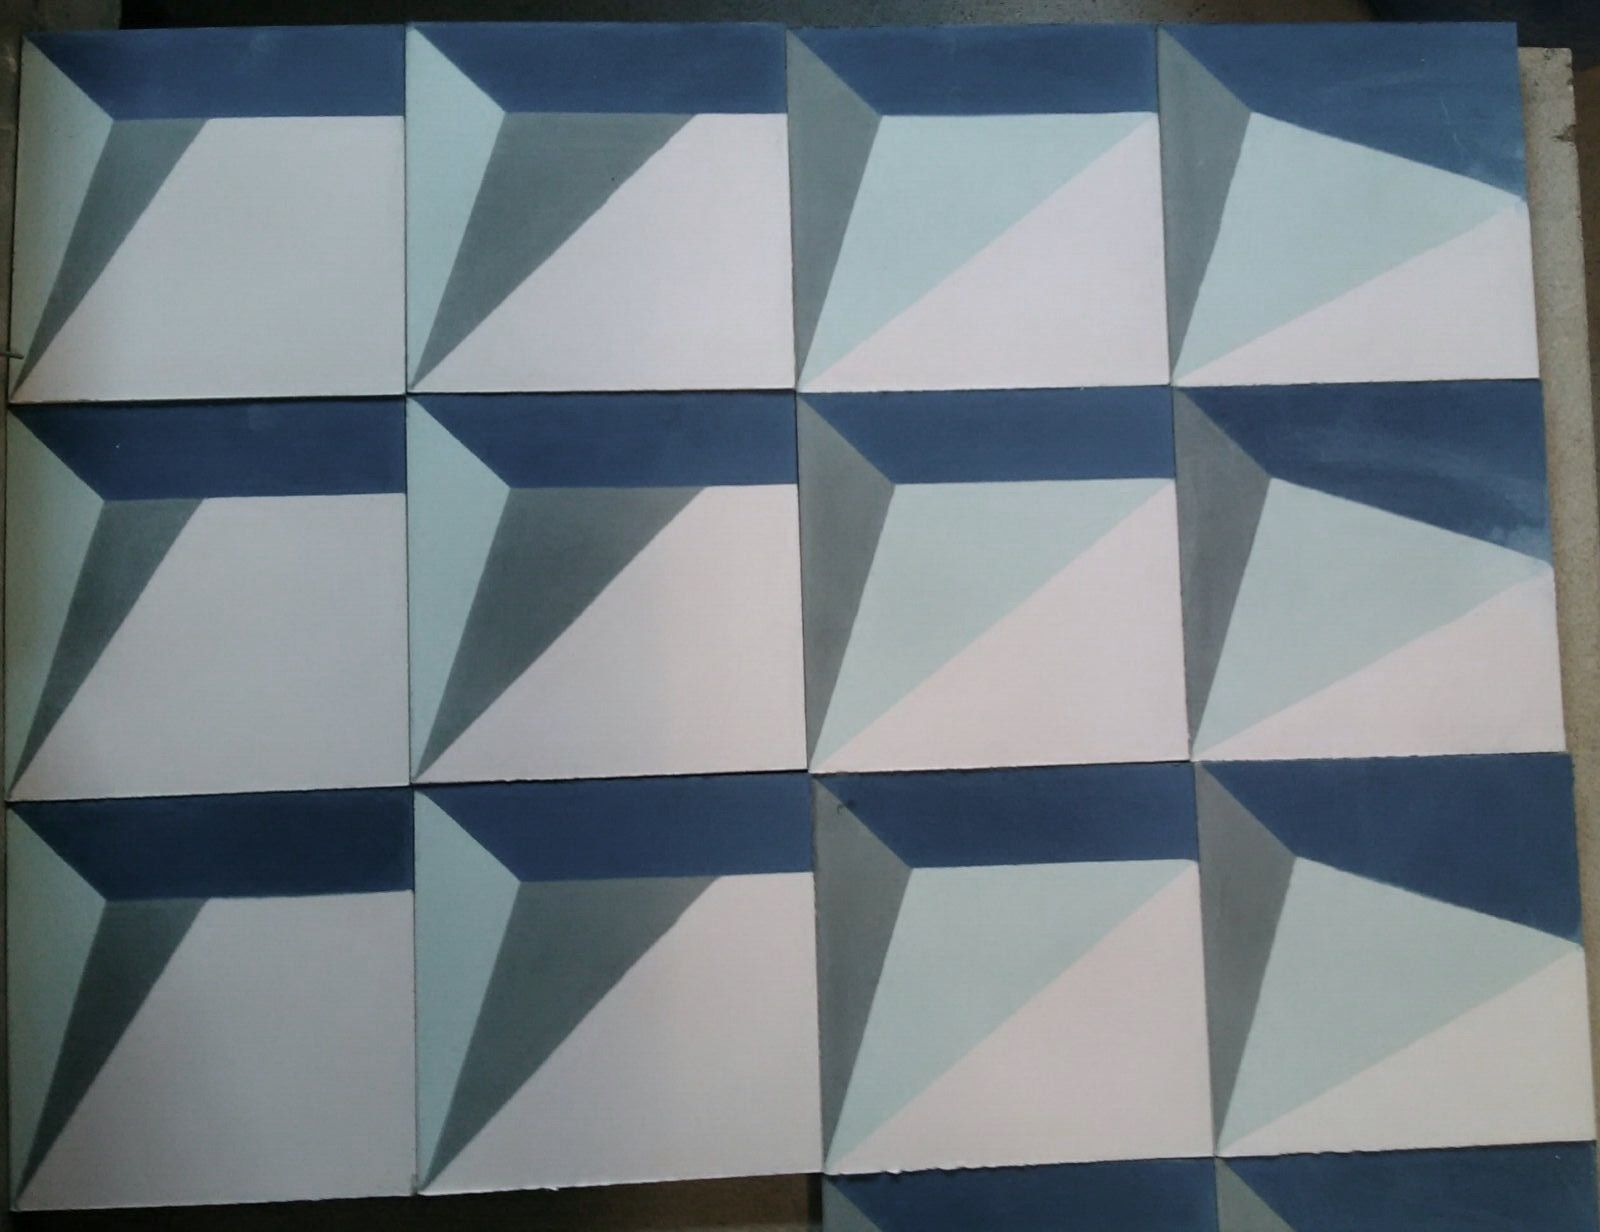 Taller-construccion-paviment-hiruki-4-mosaicsmarti